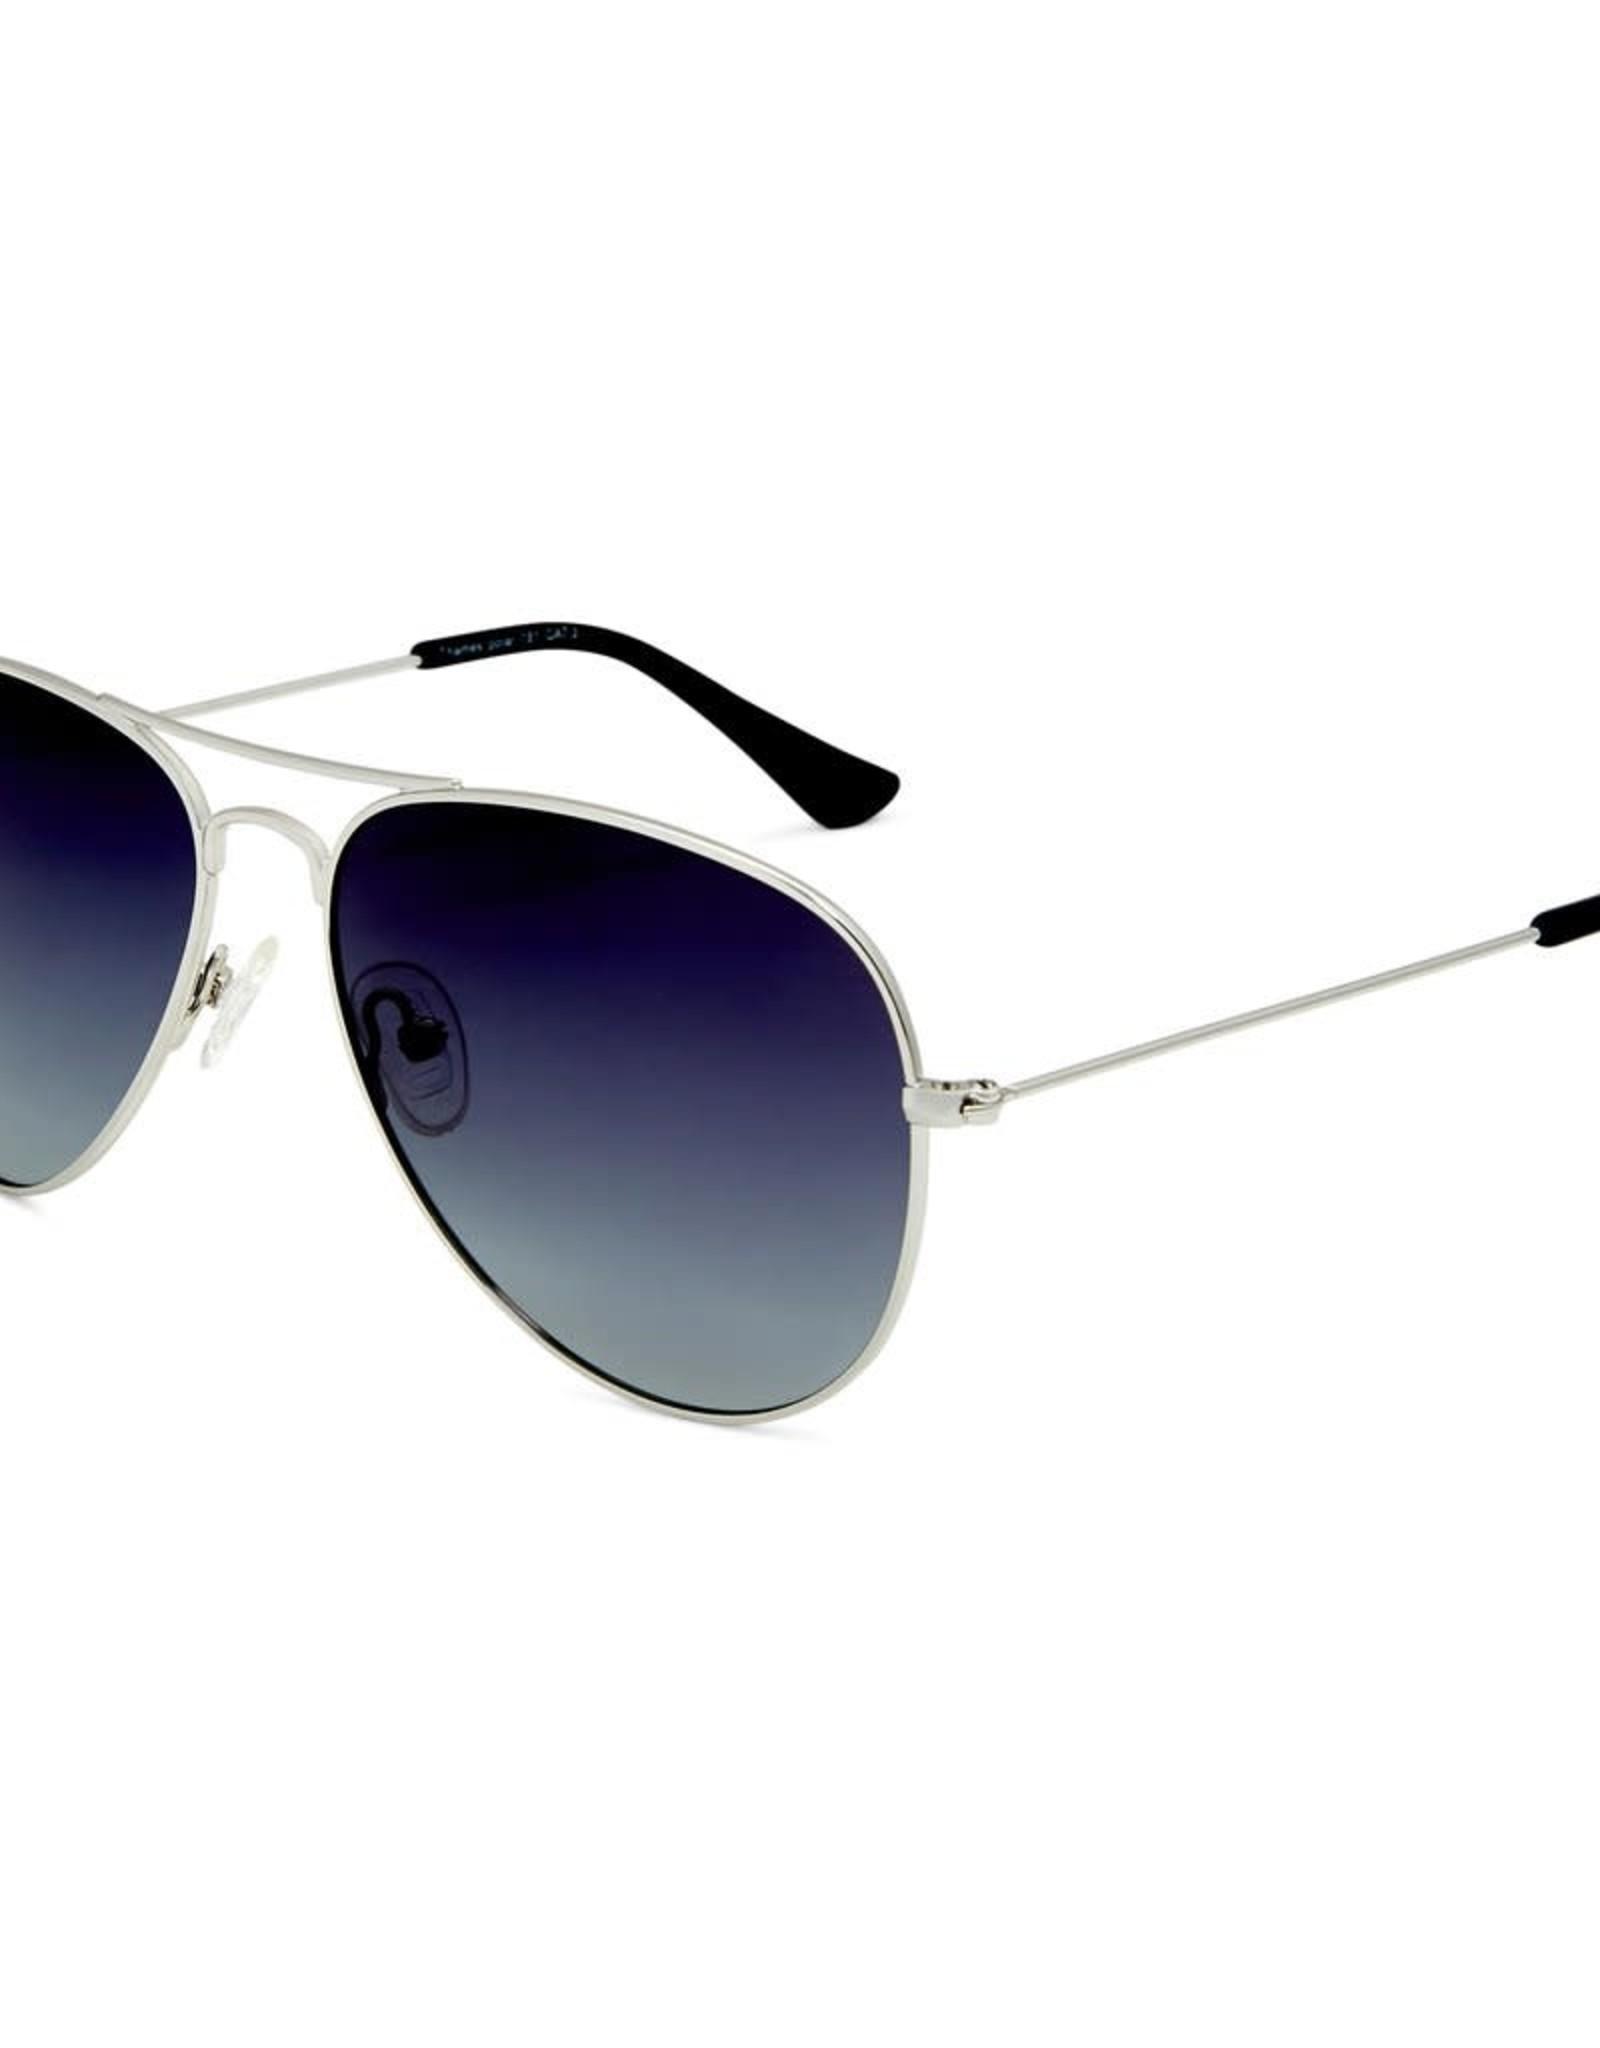 Thames Polarised Vintage Aviator Frame Sunglasses - Silver Grad- Smoke Lens